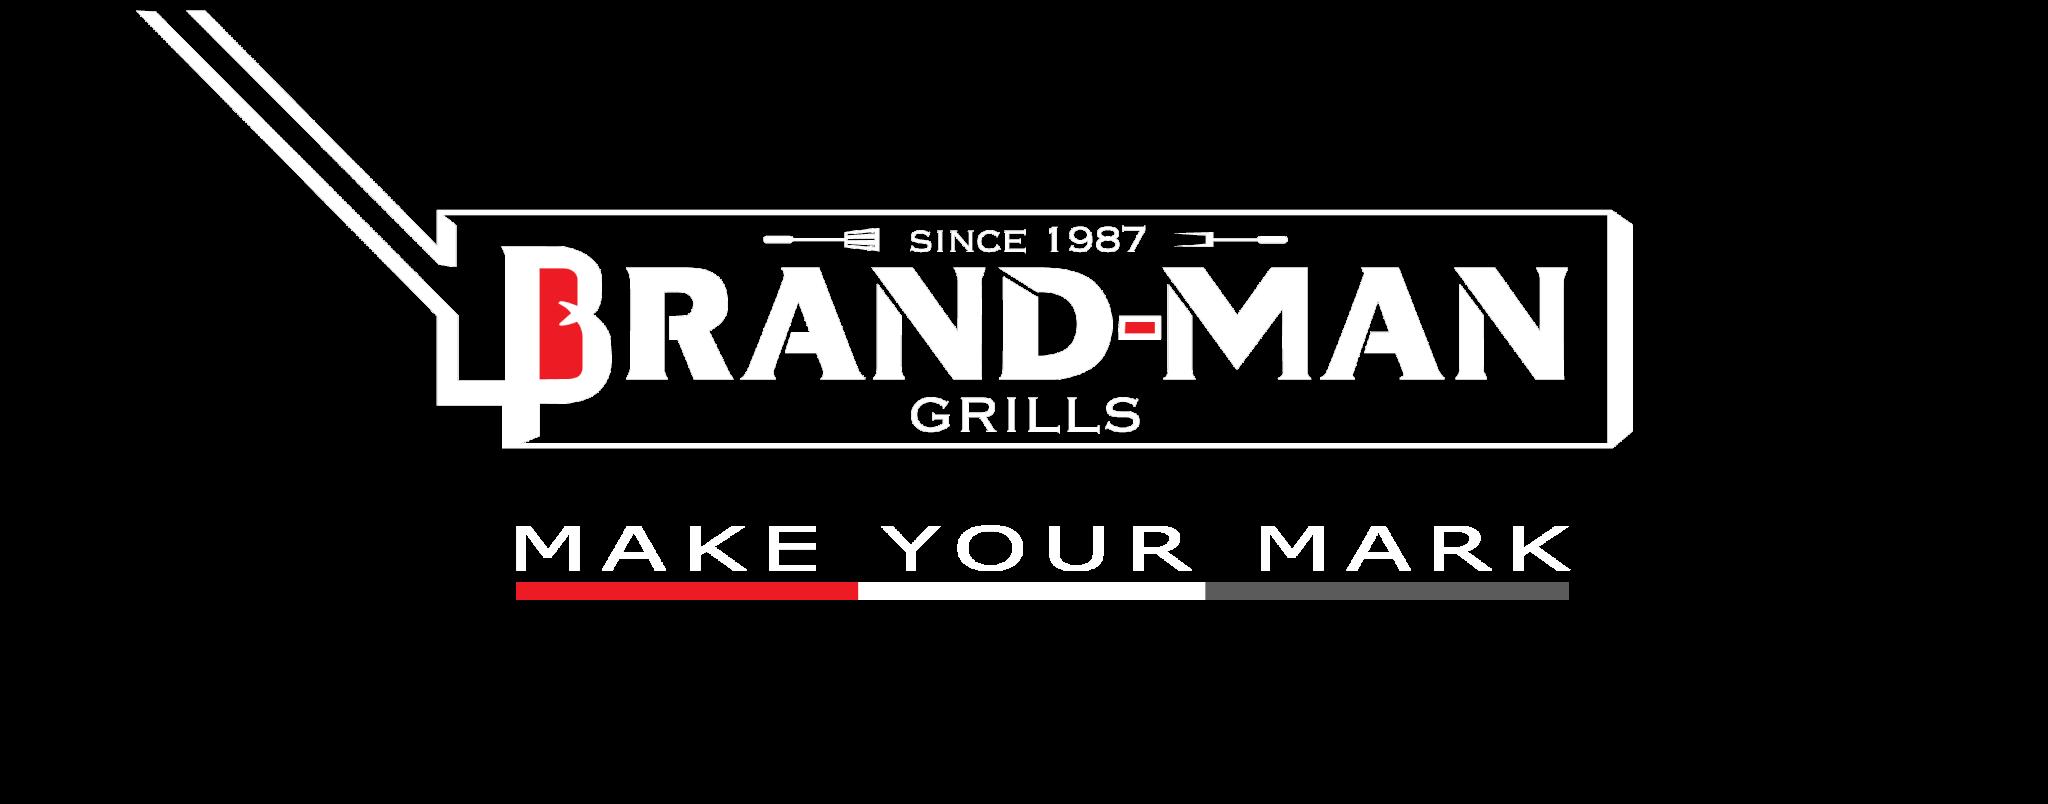 Brand-Man Grill